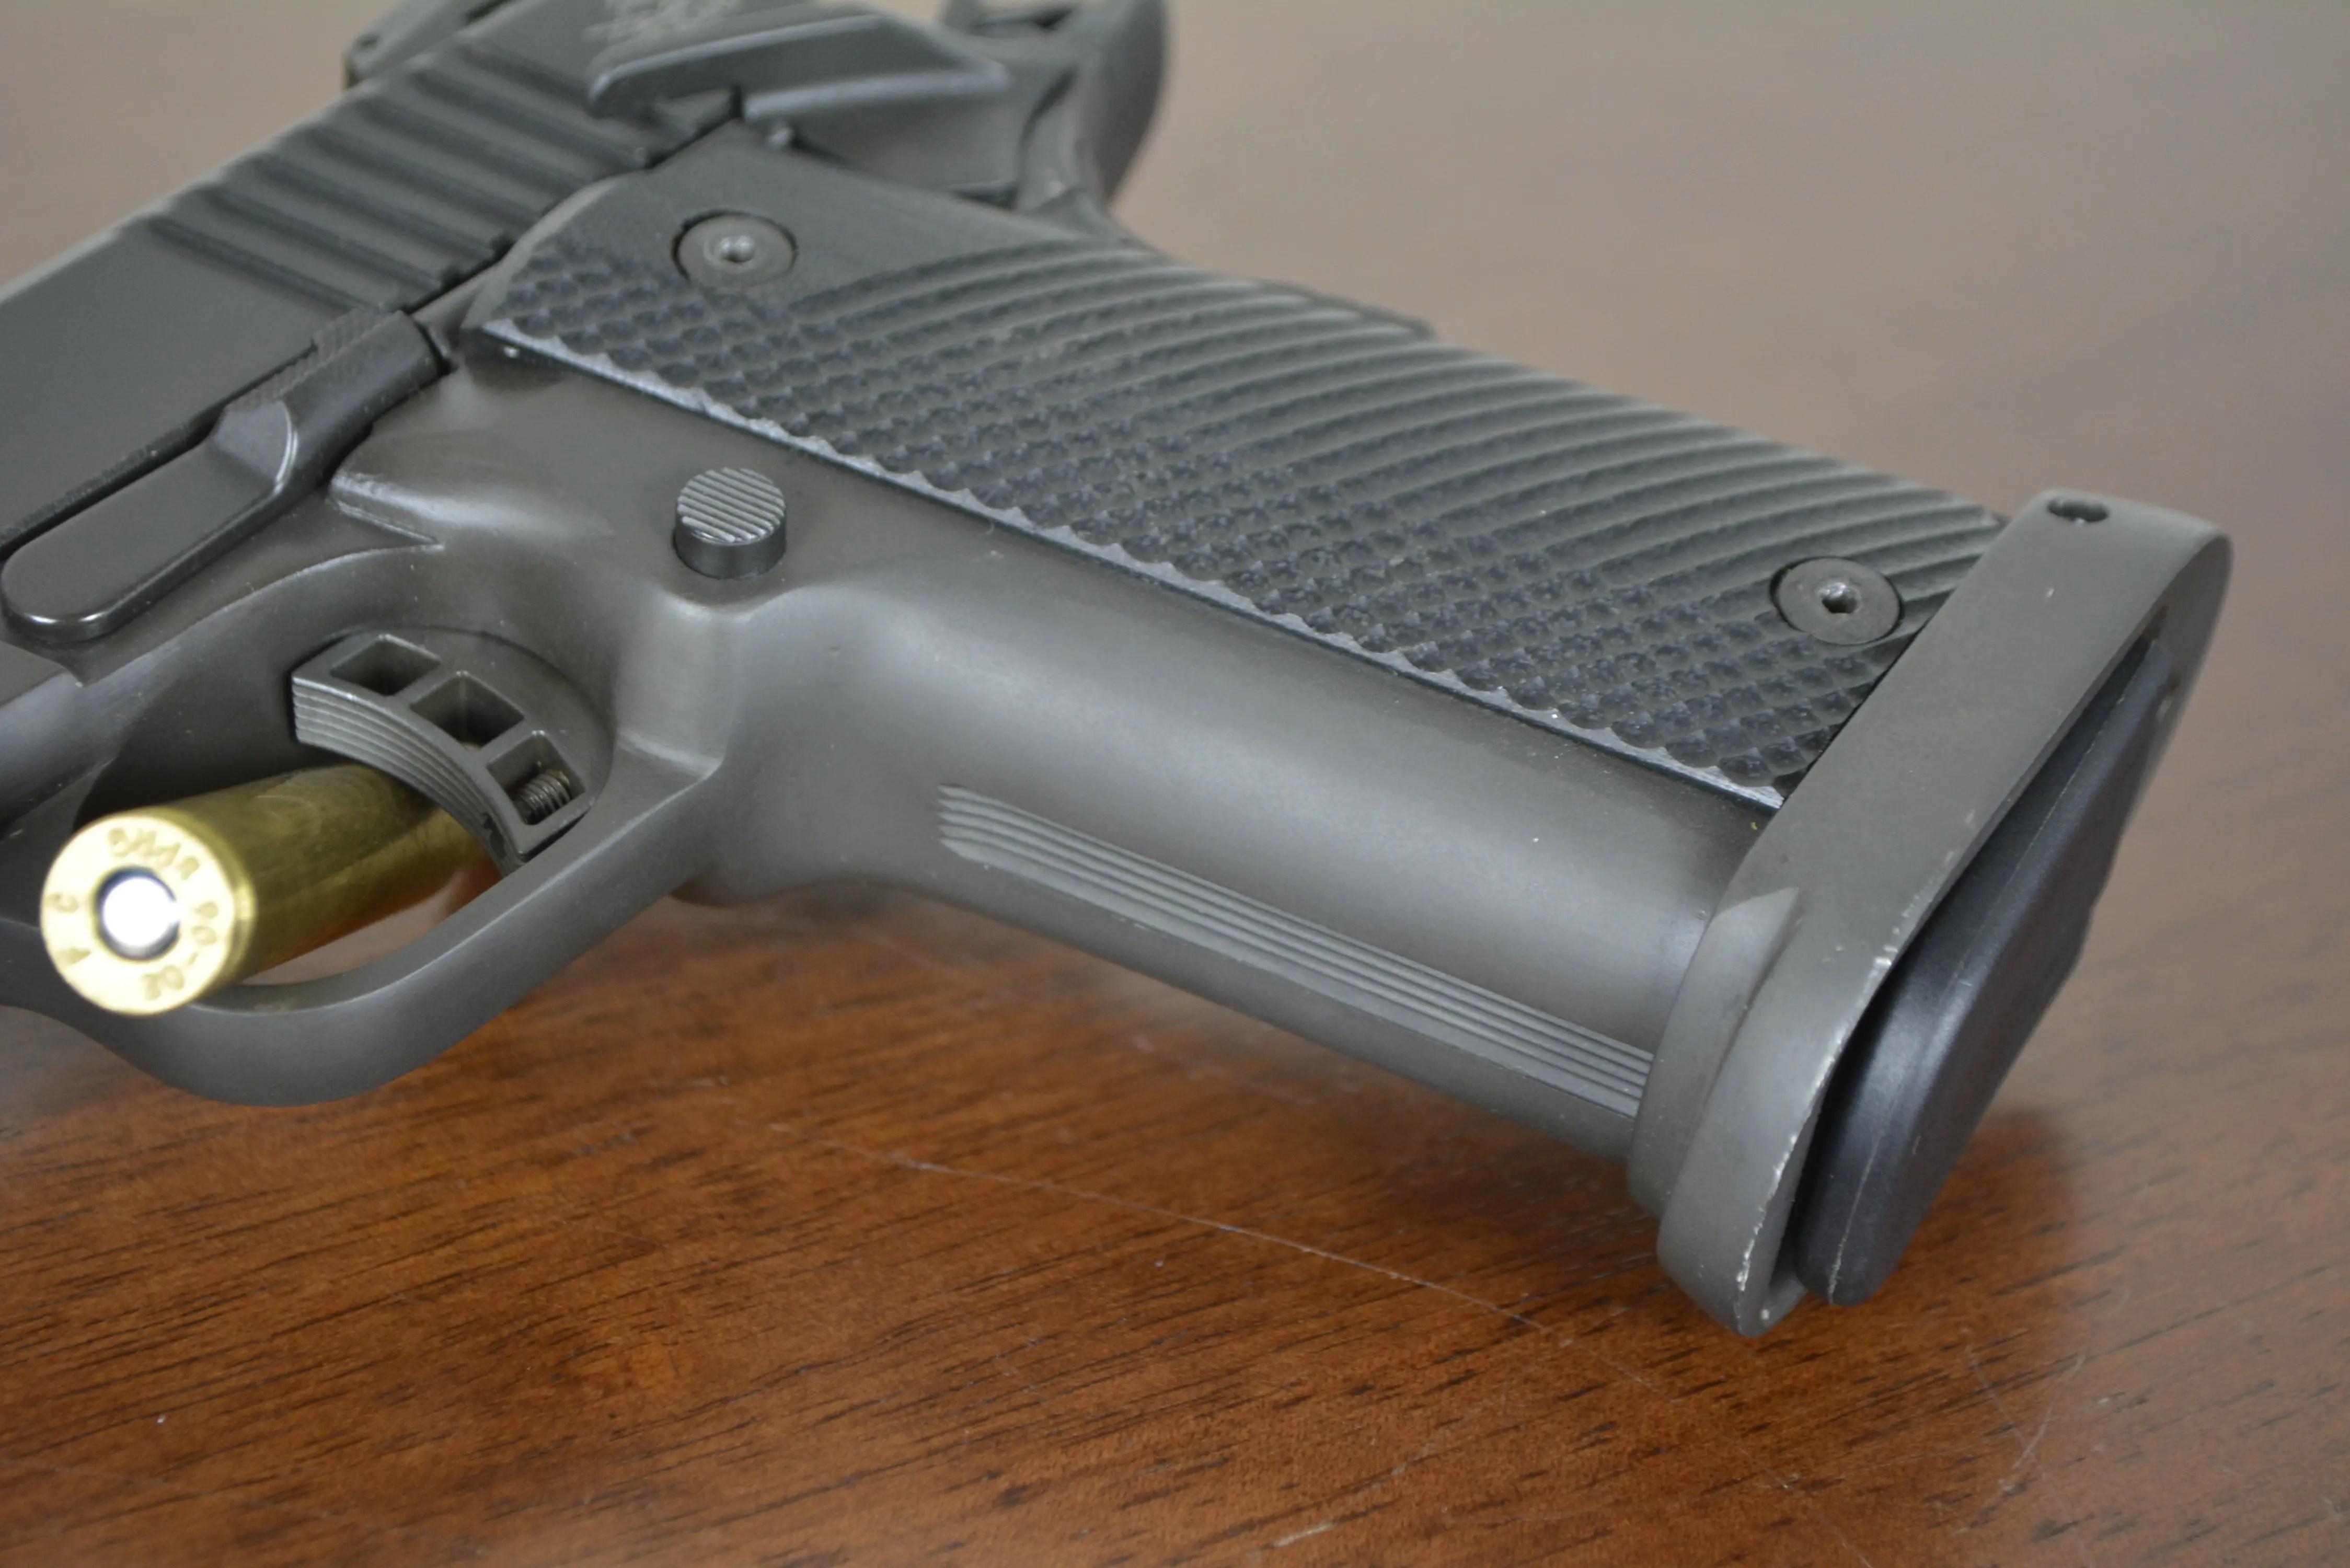 Rock Island Armory Tac Ultra FS HC | That Thicc Boi | Firearm Rack